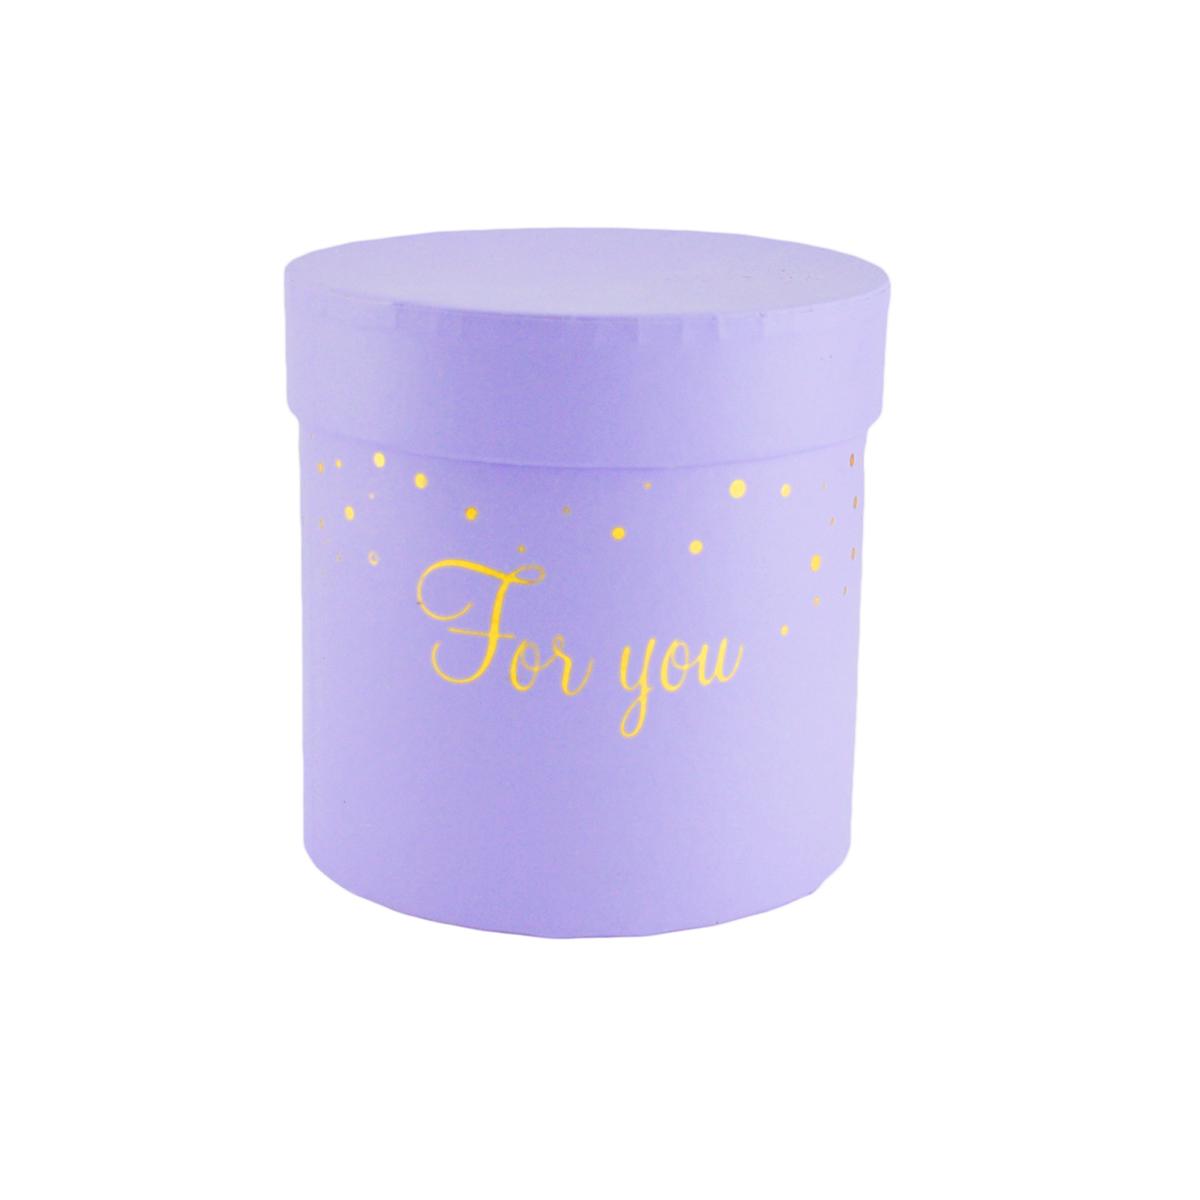 Cutie cilindrica fara manere for you mov pastel